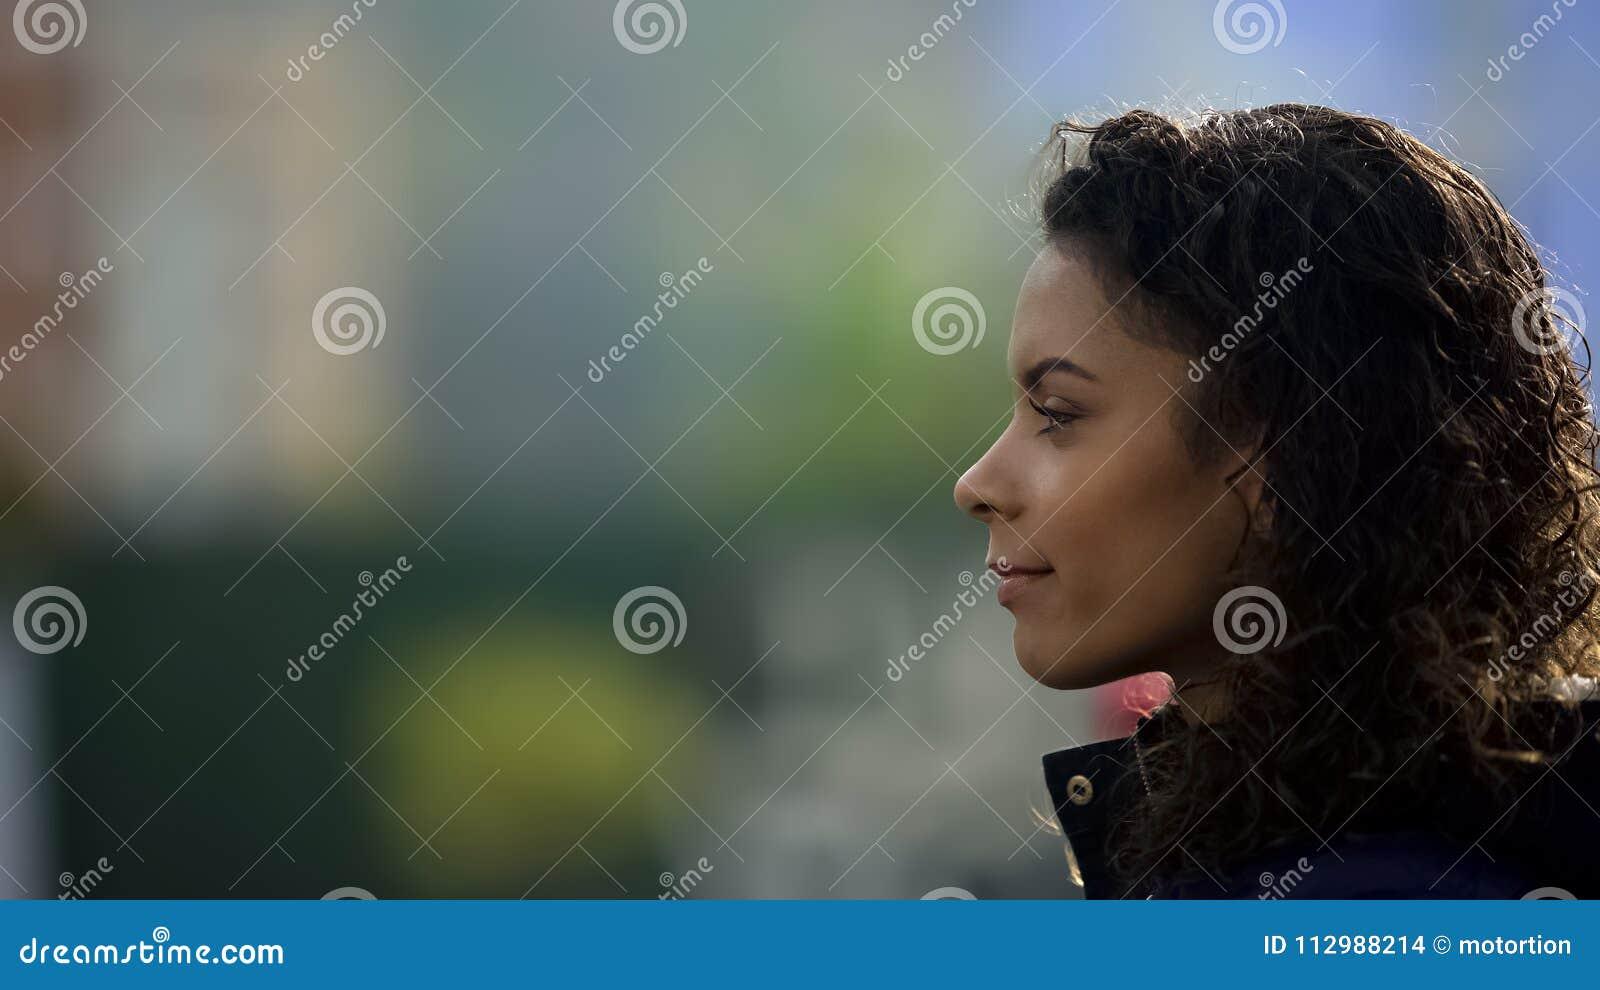 Sonrisa modelo femenina inspirada, retrato biracial hermoso de la señora joven en perfil